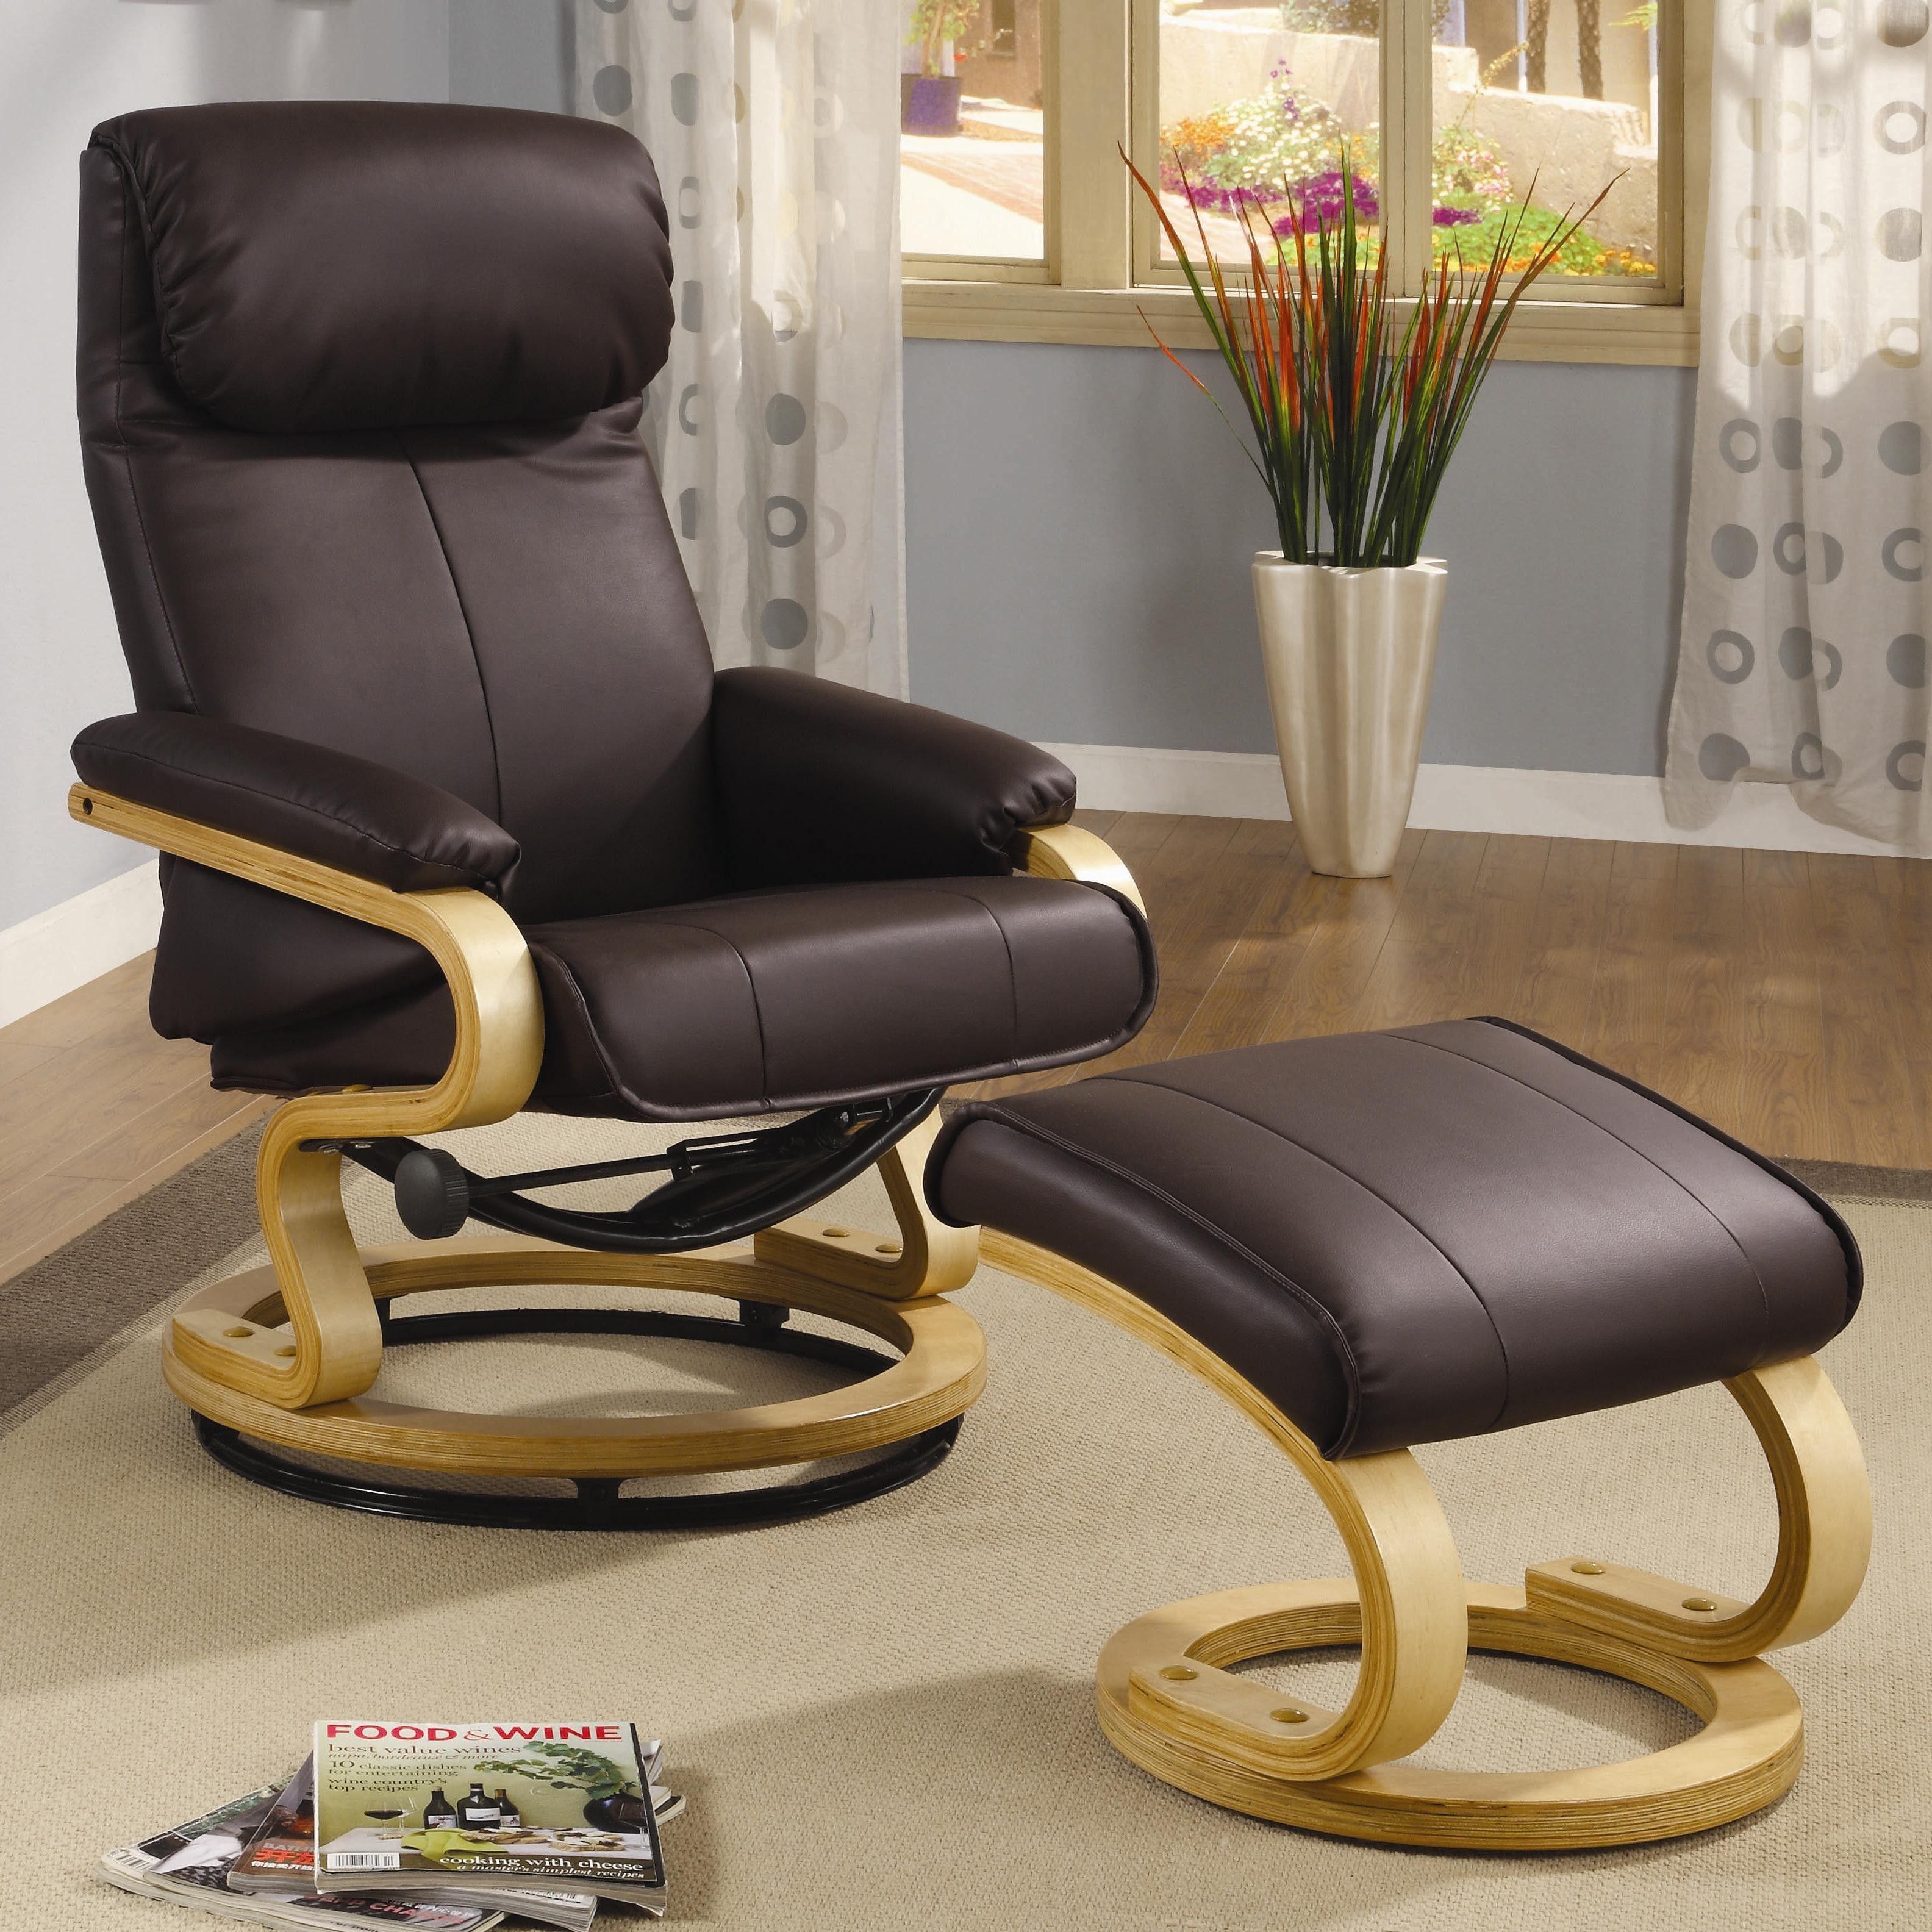 stylish designer recliner chairs